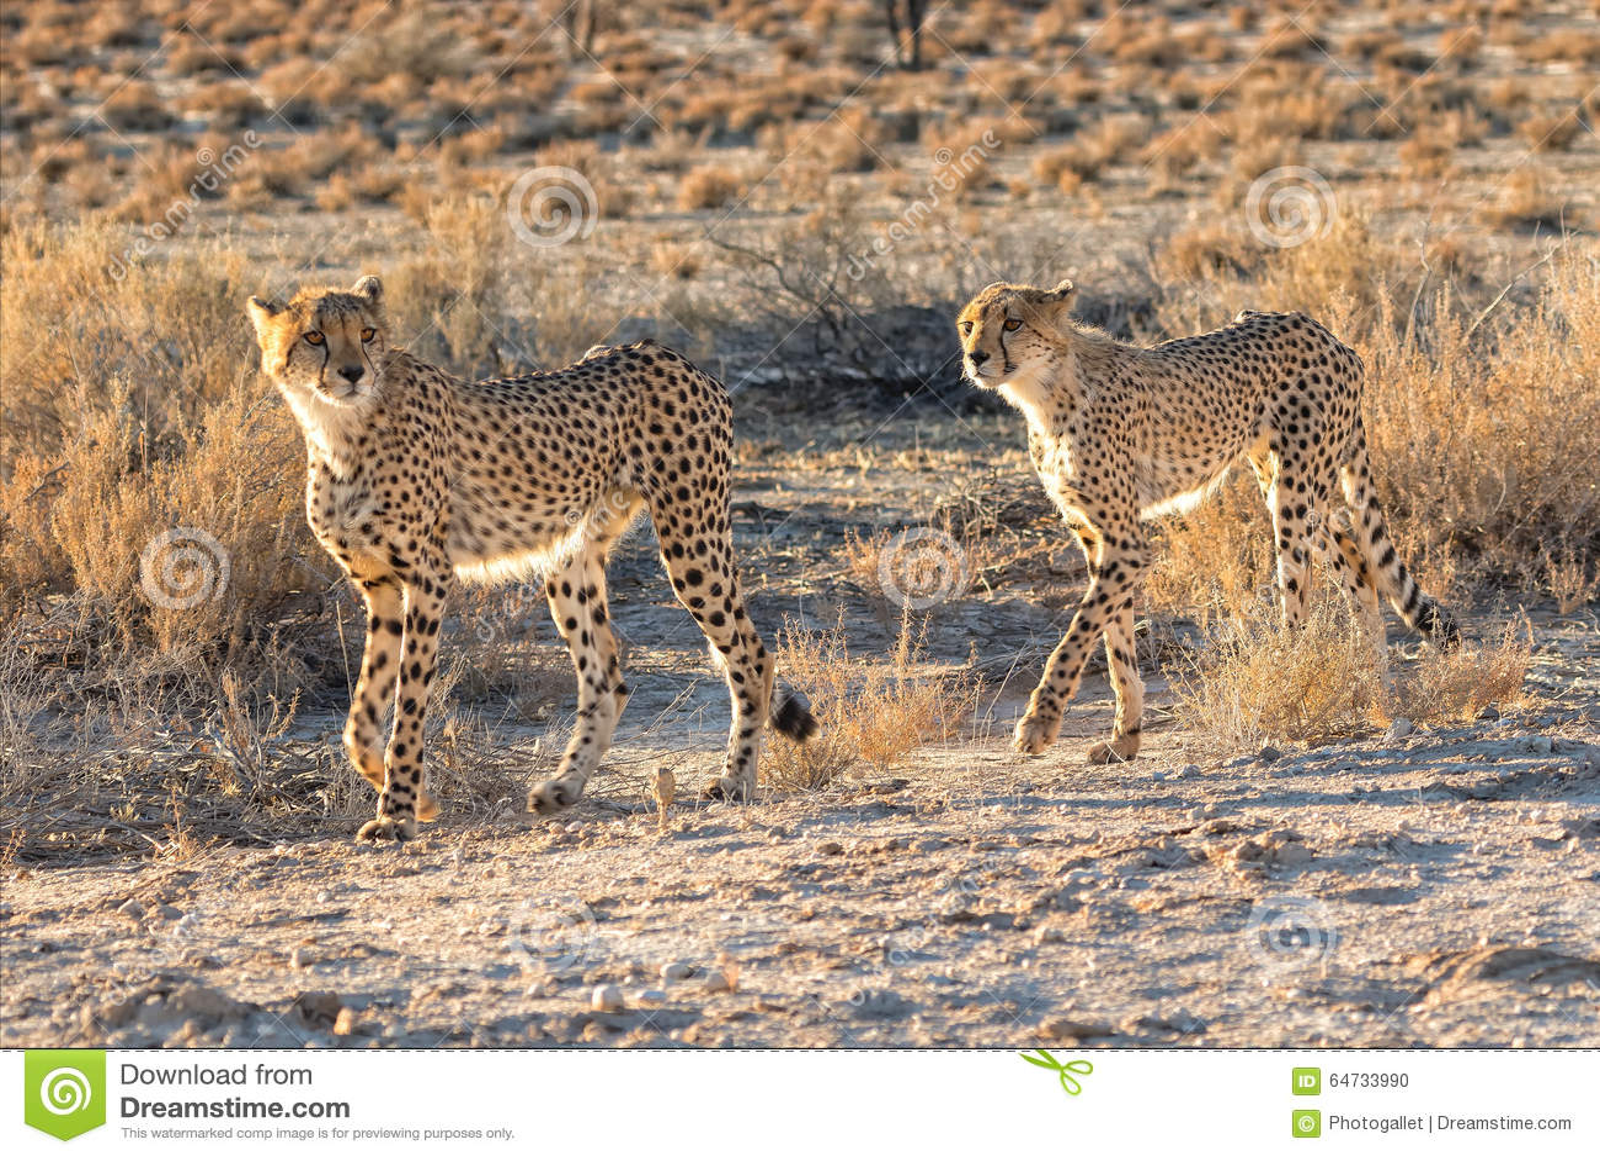 Ghepardi al parco nazionale frontaliero di kgalagadai